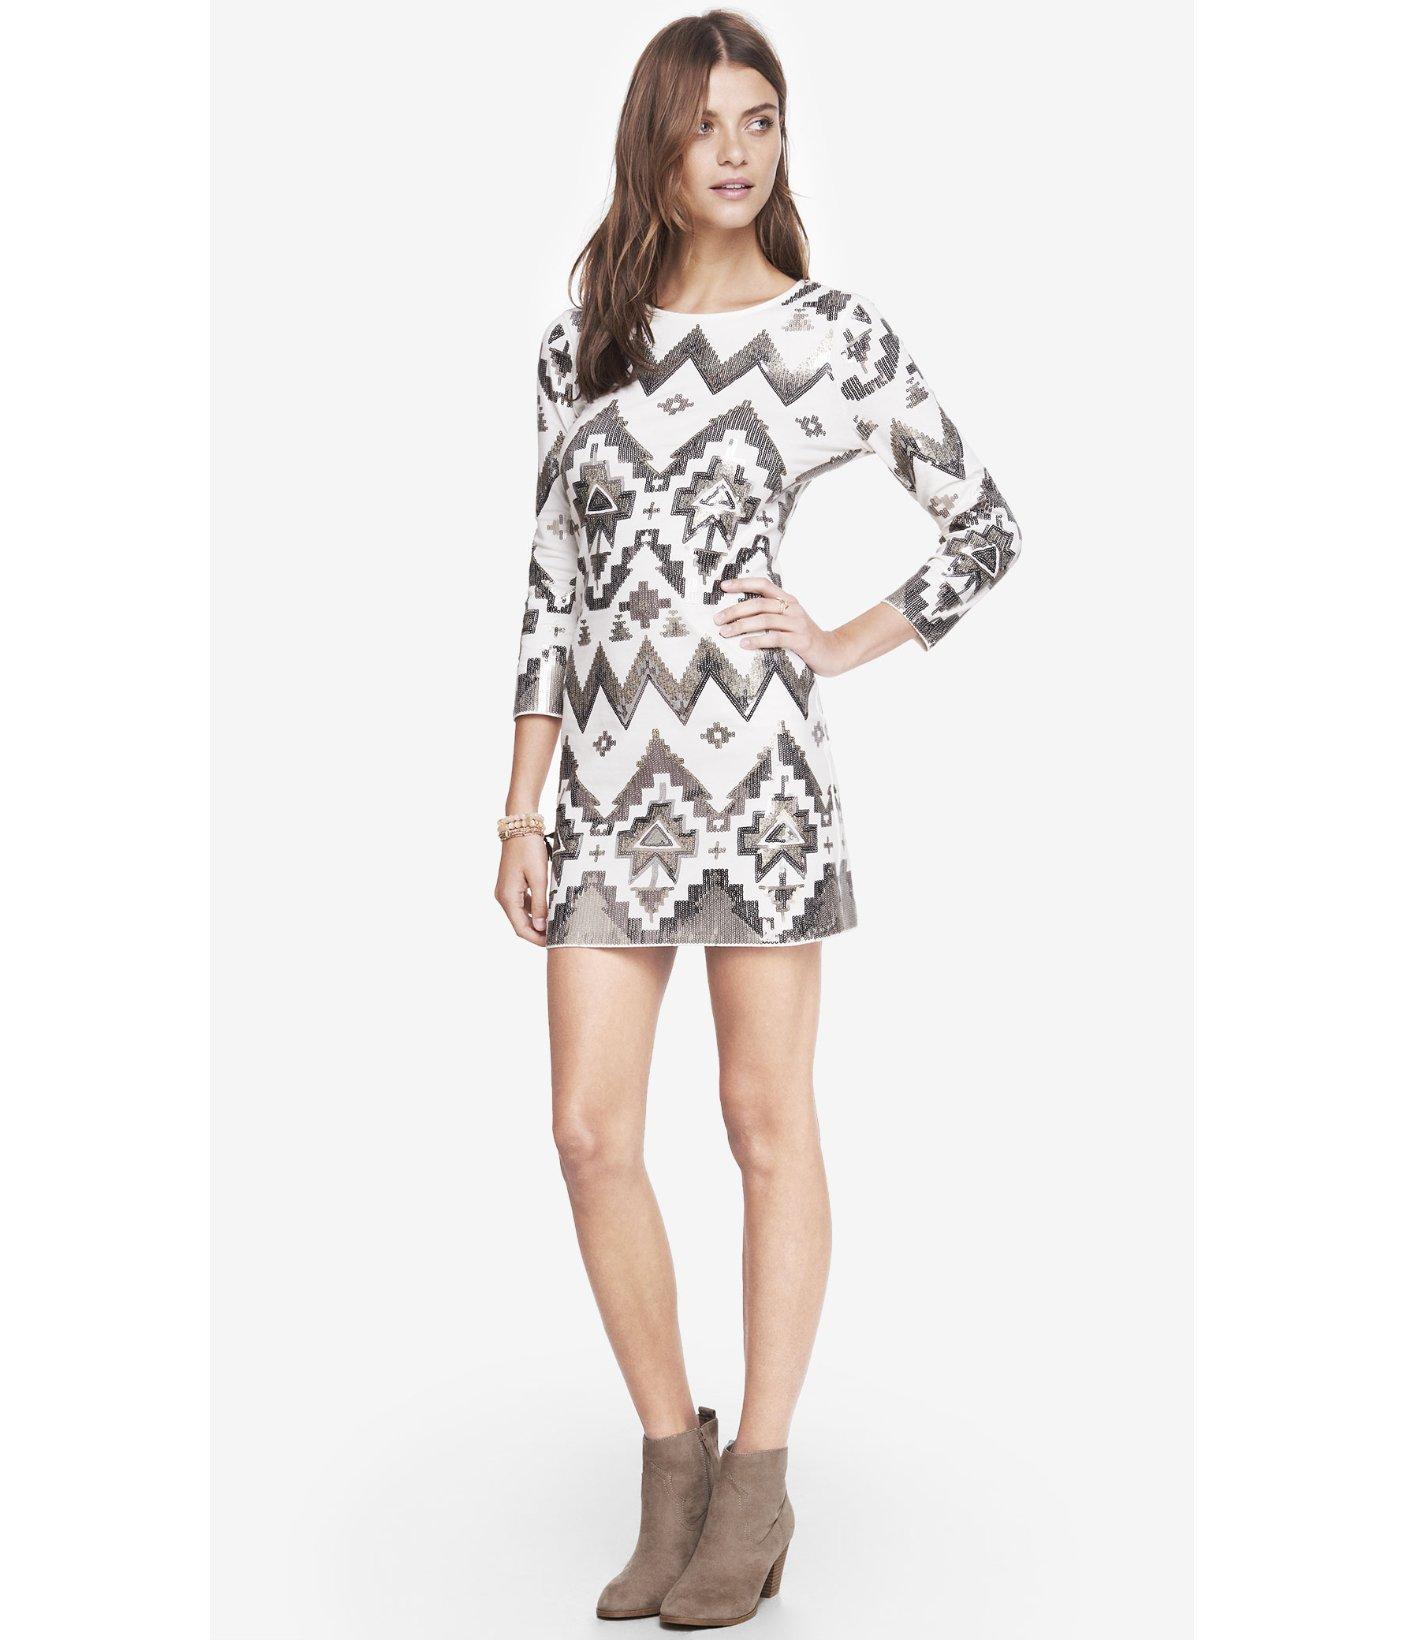 ecd101e2d5ba Express Aztec Sequin Embellished Mini Dress in White - Lyst